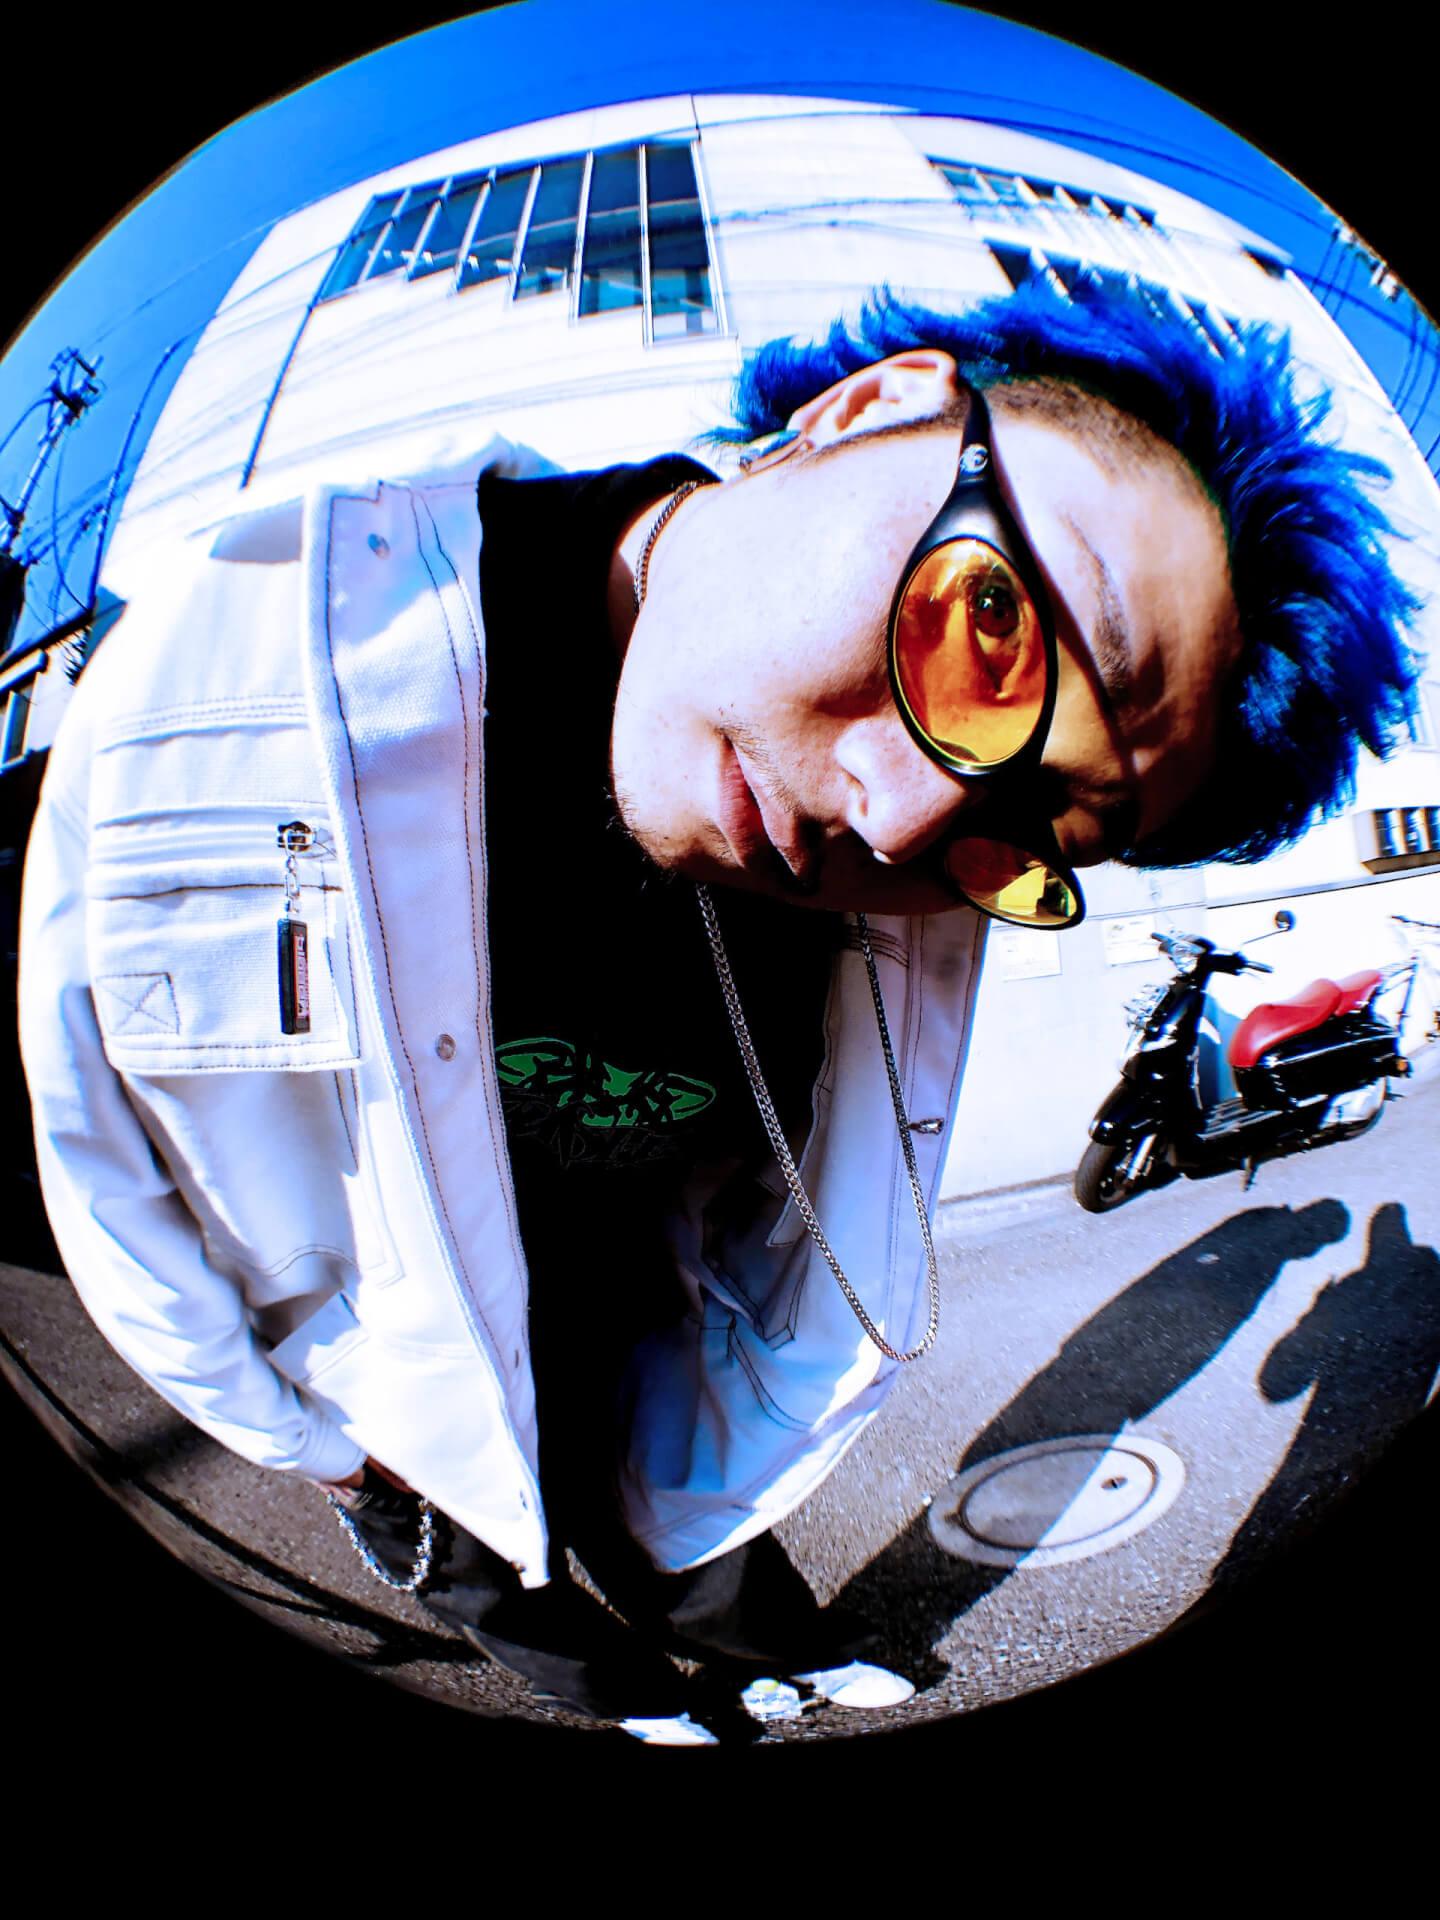 "JUBEEがSARA-Jを迎えた2ステップ・サウンドの楽曲""Joyride""のMVを公開|BABEL LABEL・Riku Ozamaが監修 music200721_jubee_1"